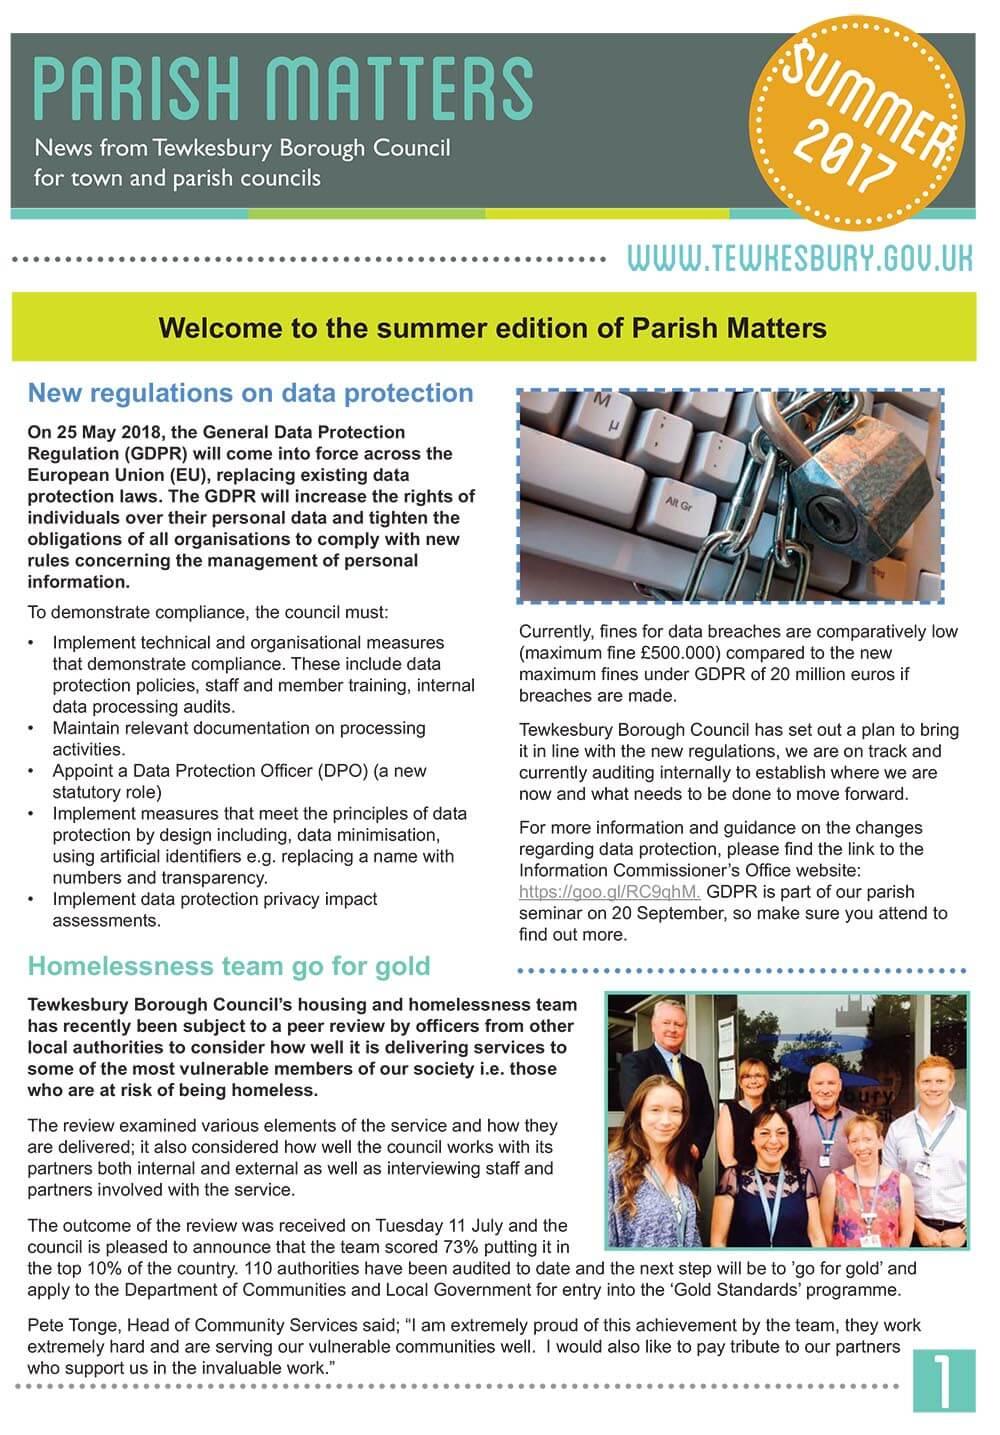 Parish Matters - August 2017